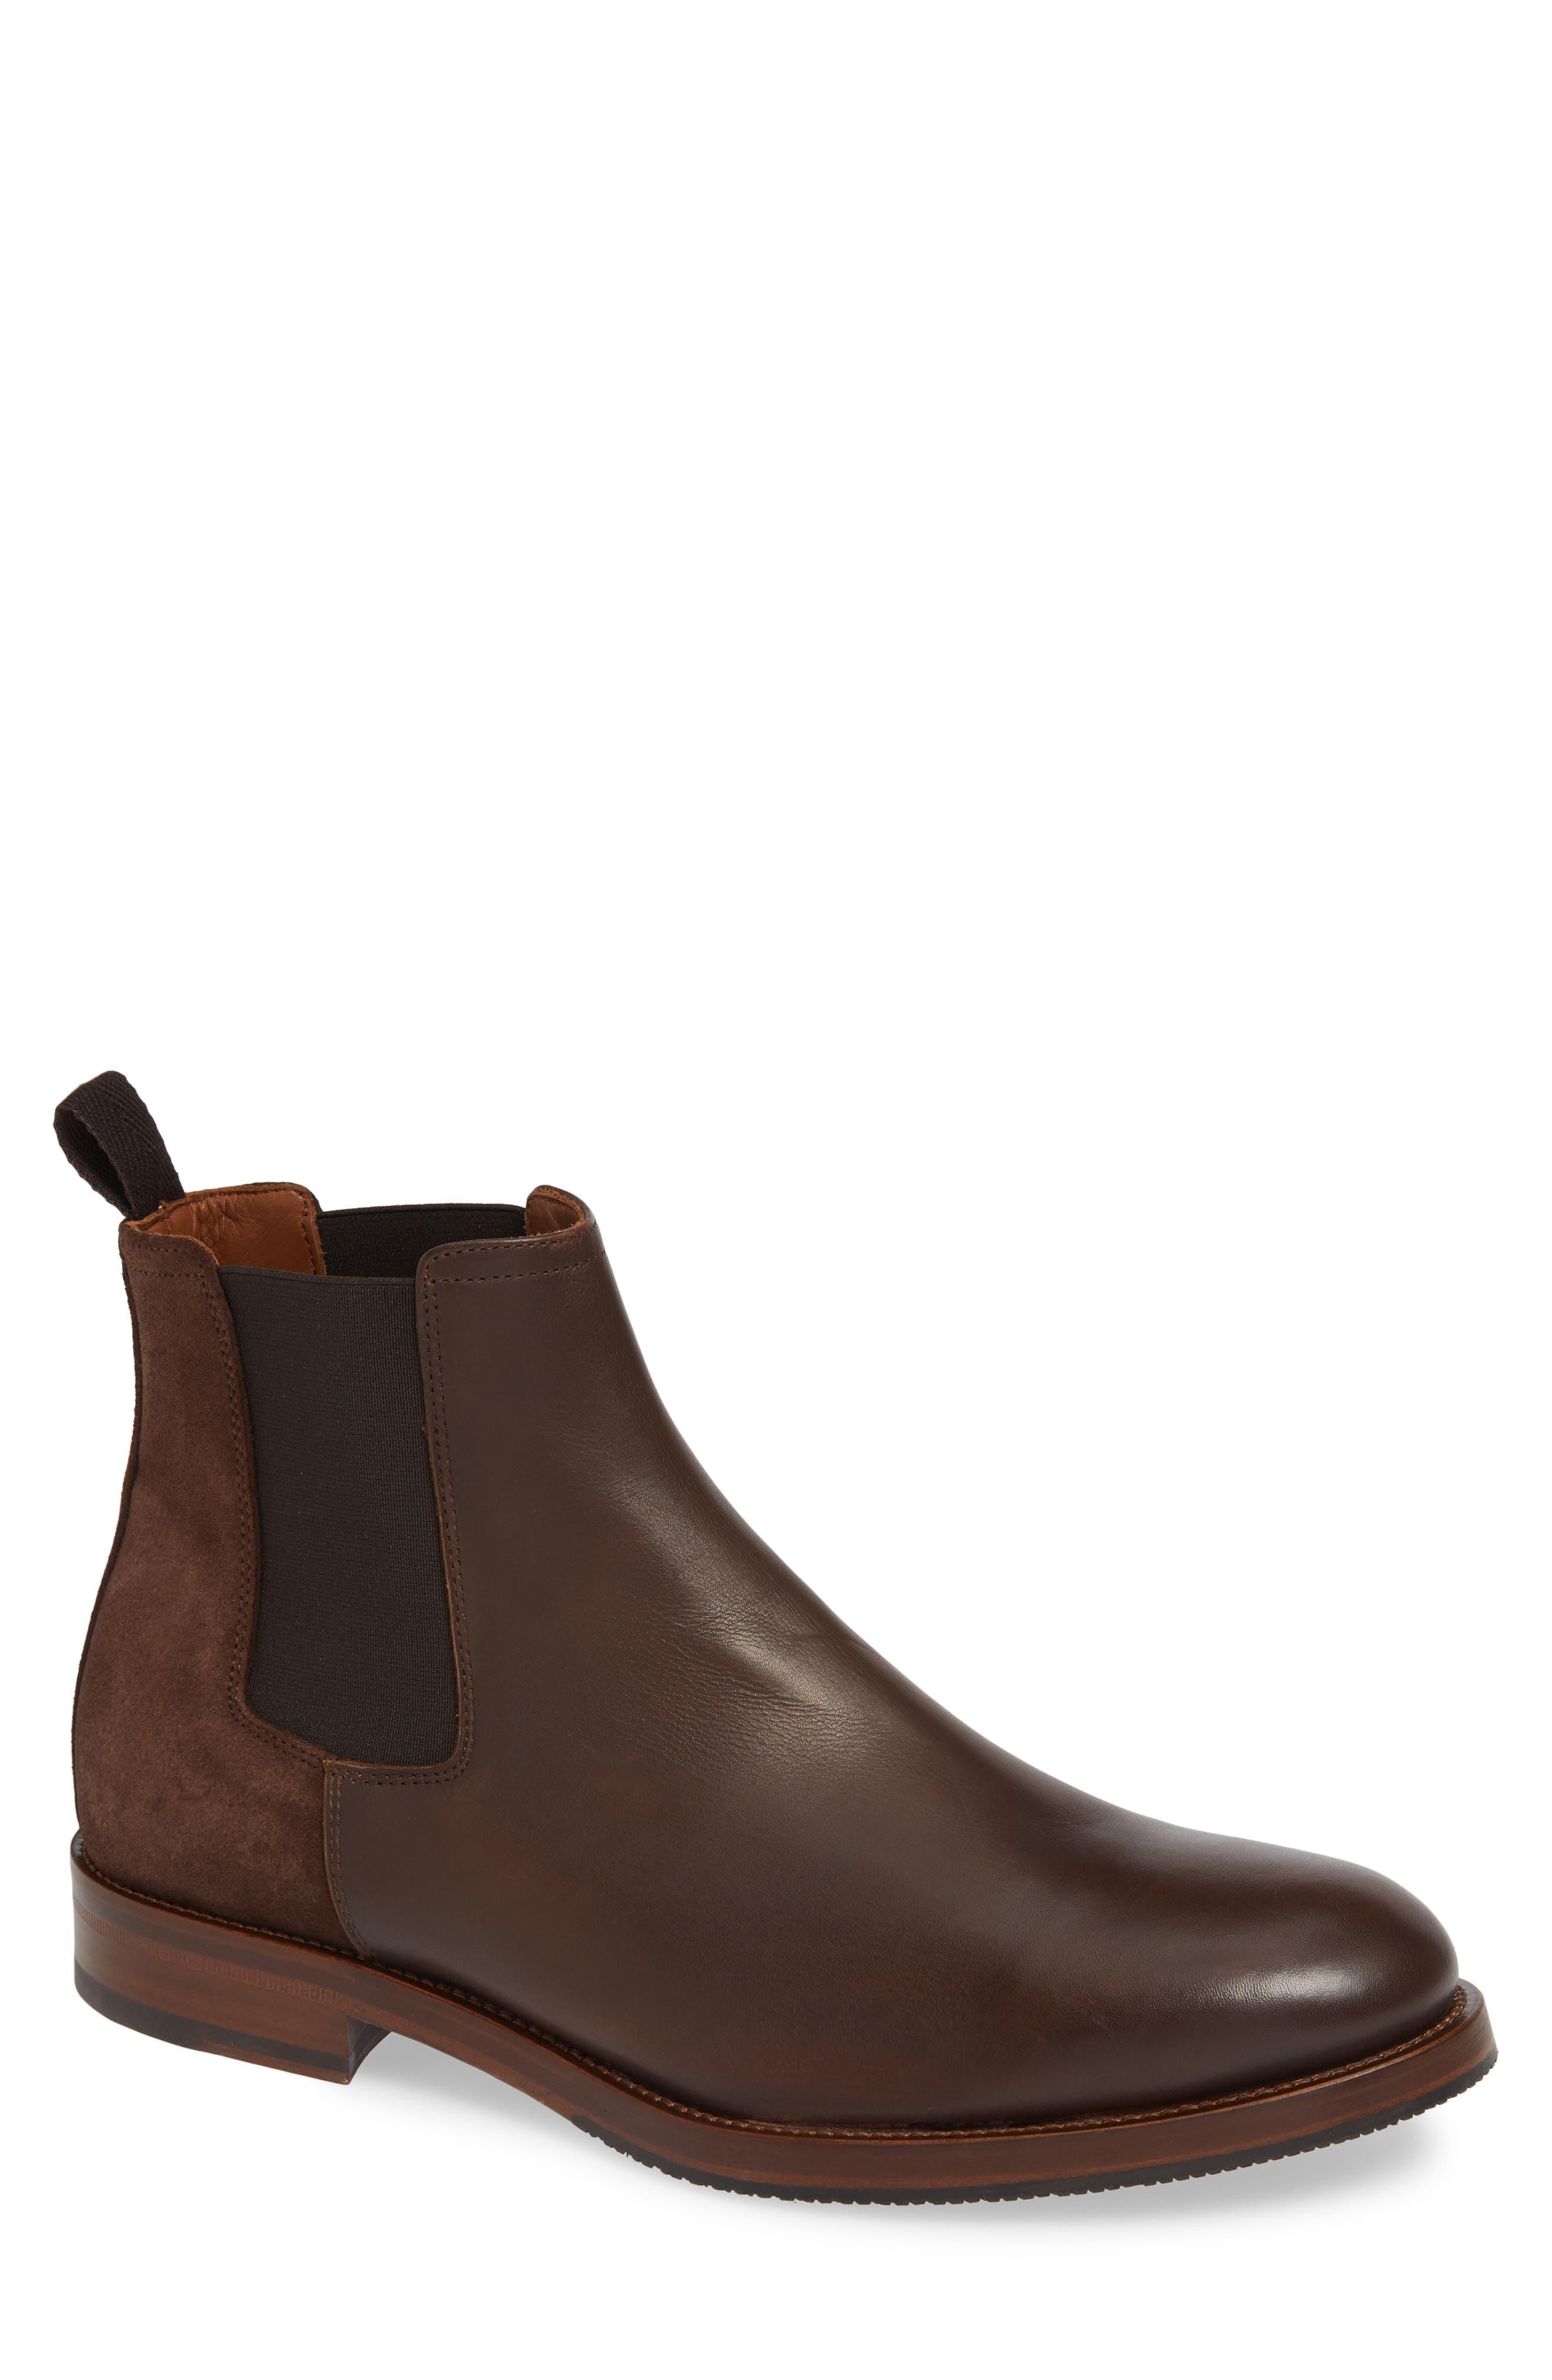 Aquatalia Giancarlo Weatherproof Chelsea Boot- Brown